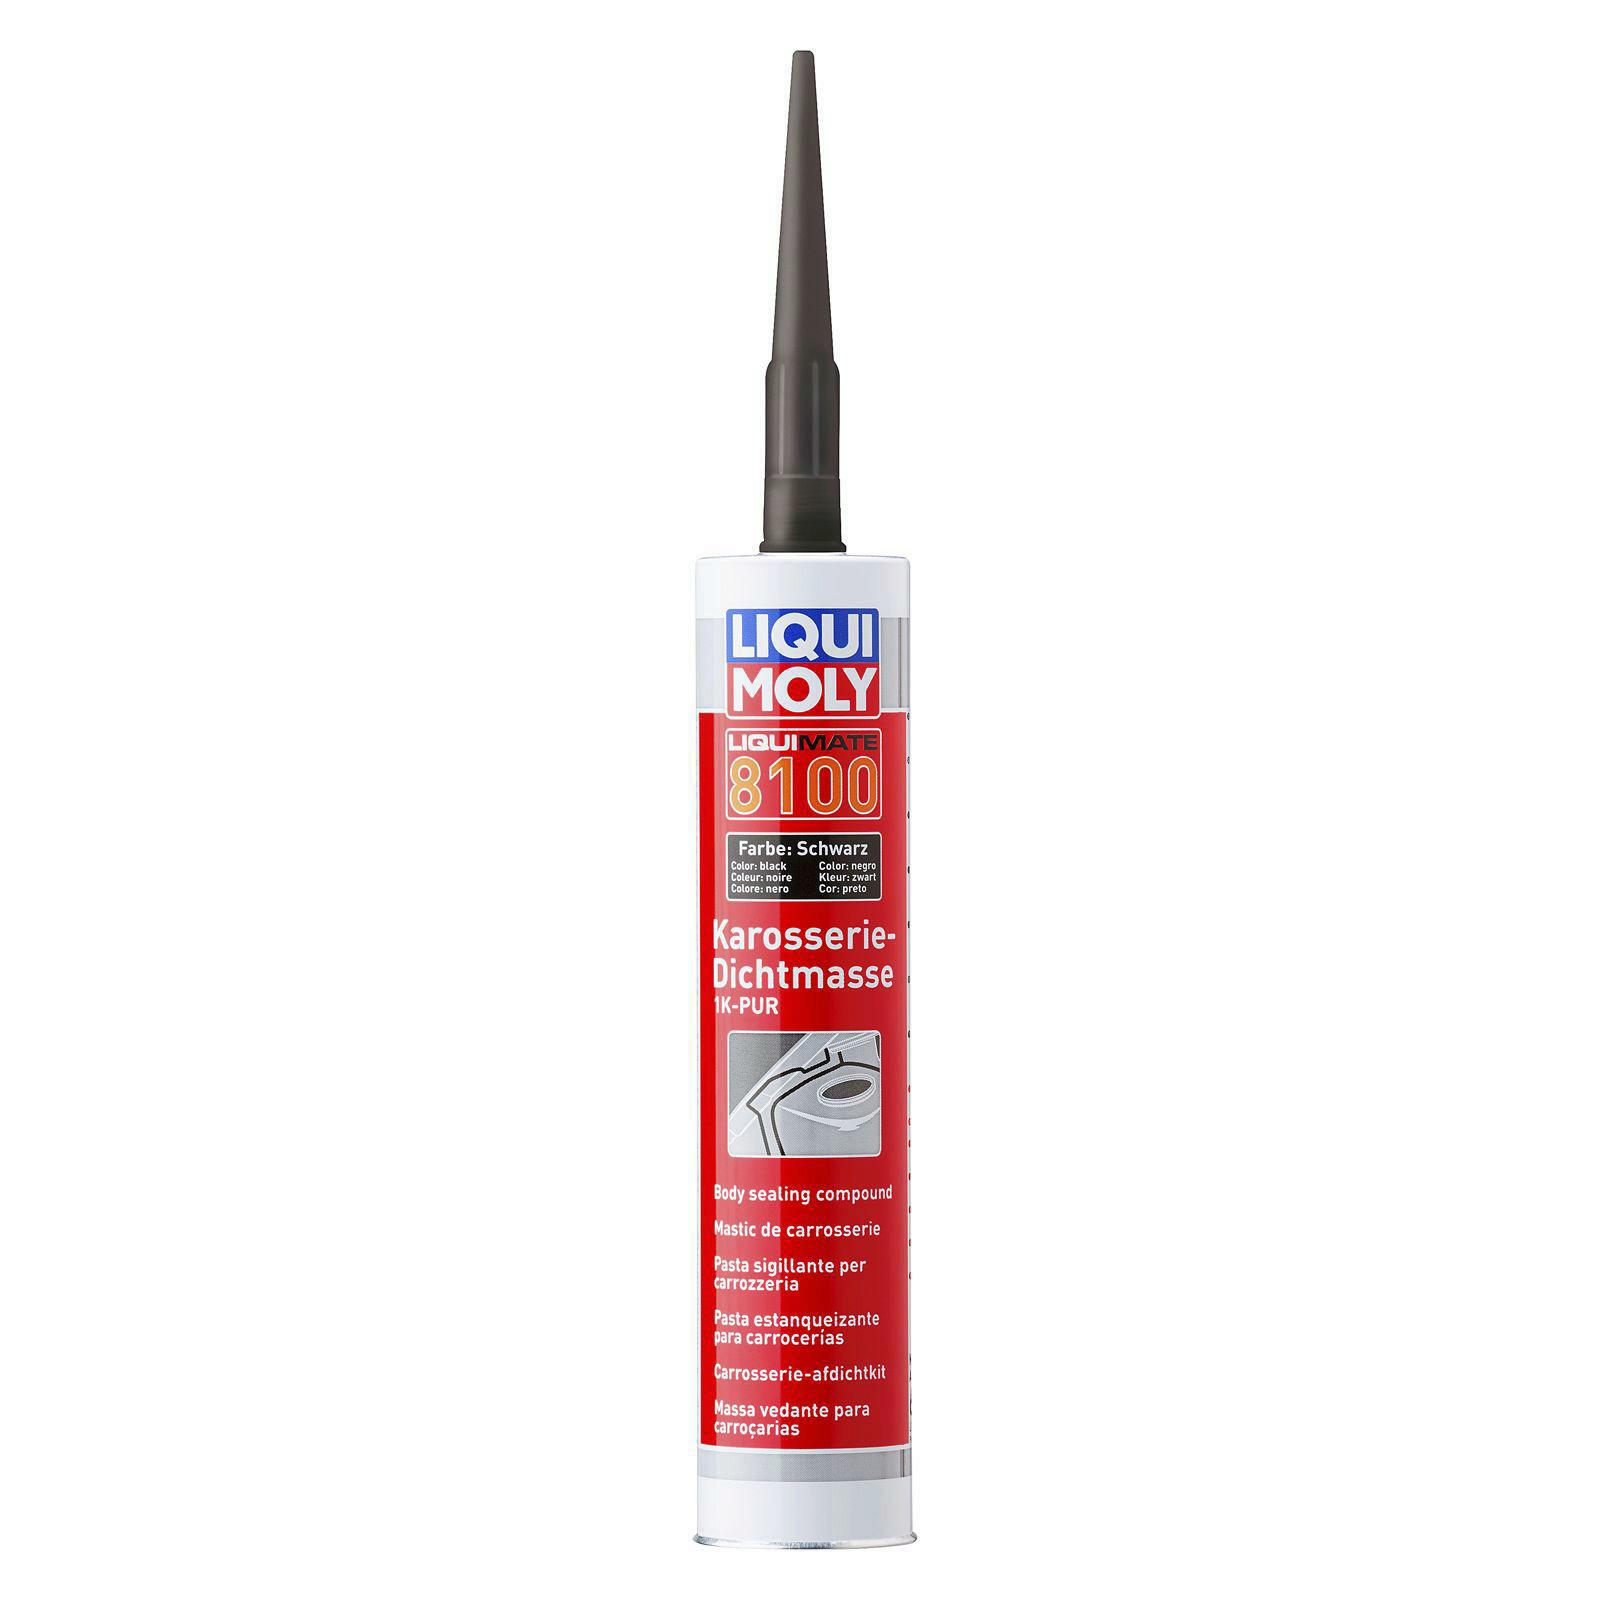 Liqui Moly Liquimate 8100 1K-PUR 300ml